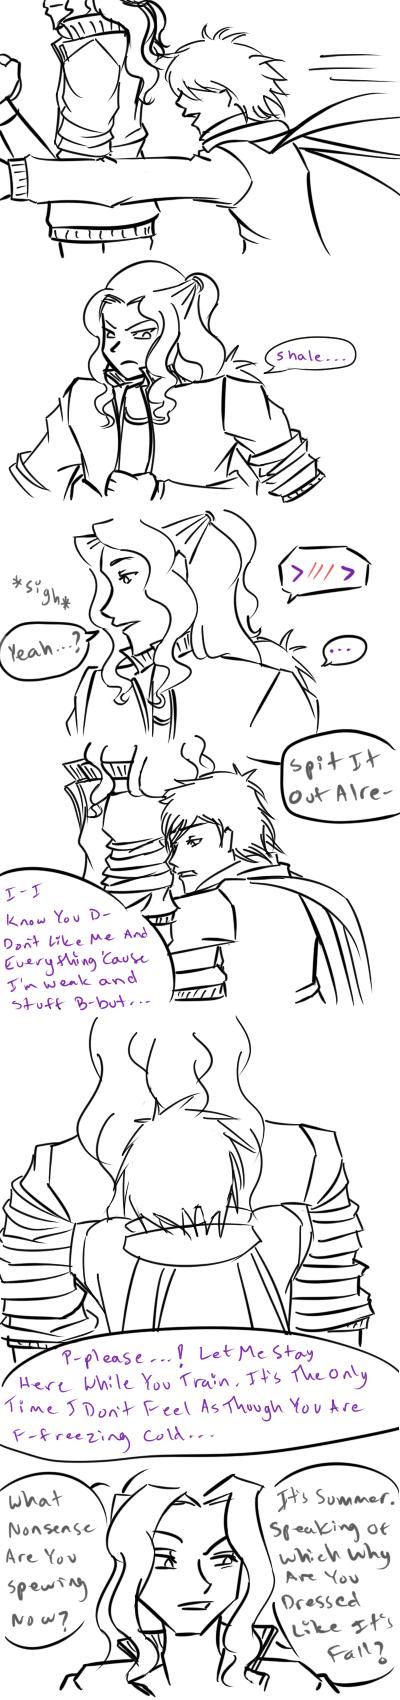 Doodle Comic - Walita Bros. - 1 by Aisuryuu